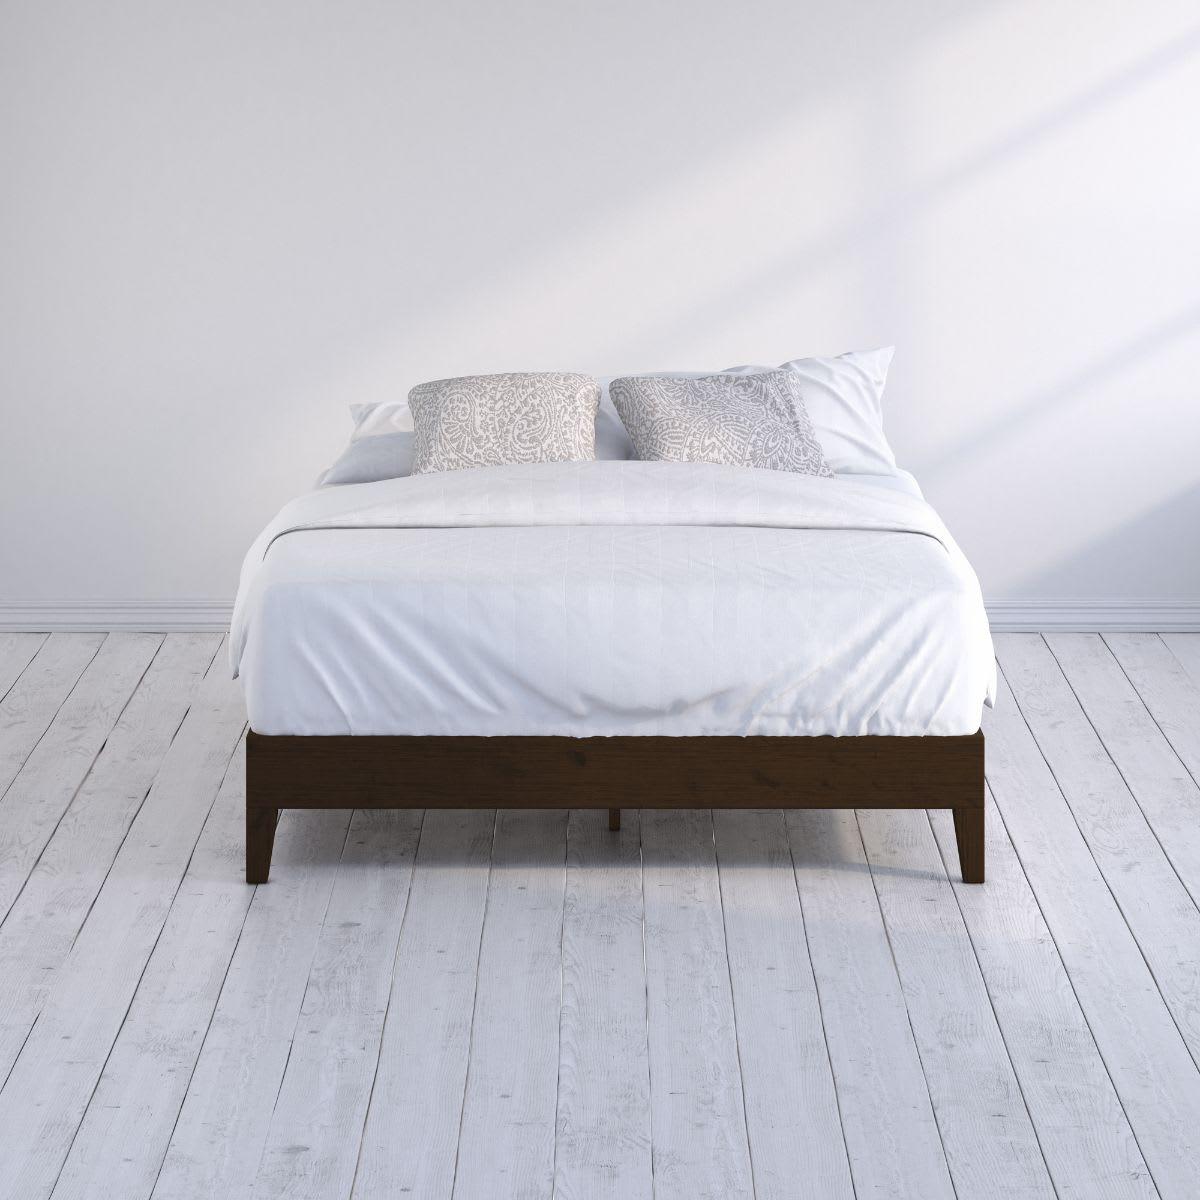 Marissa wood deluxe platform Bed frame Hero Web